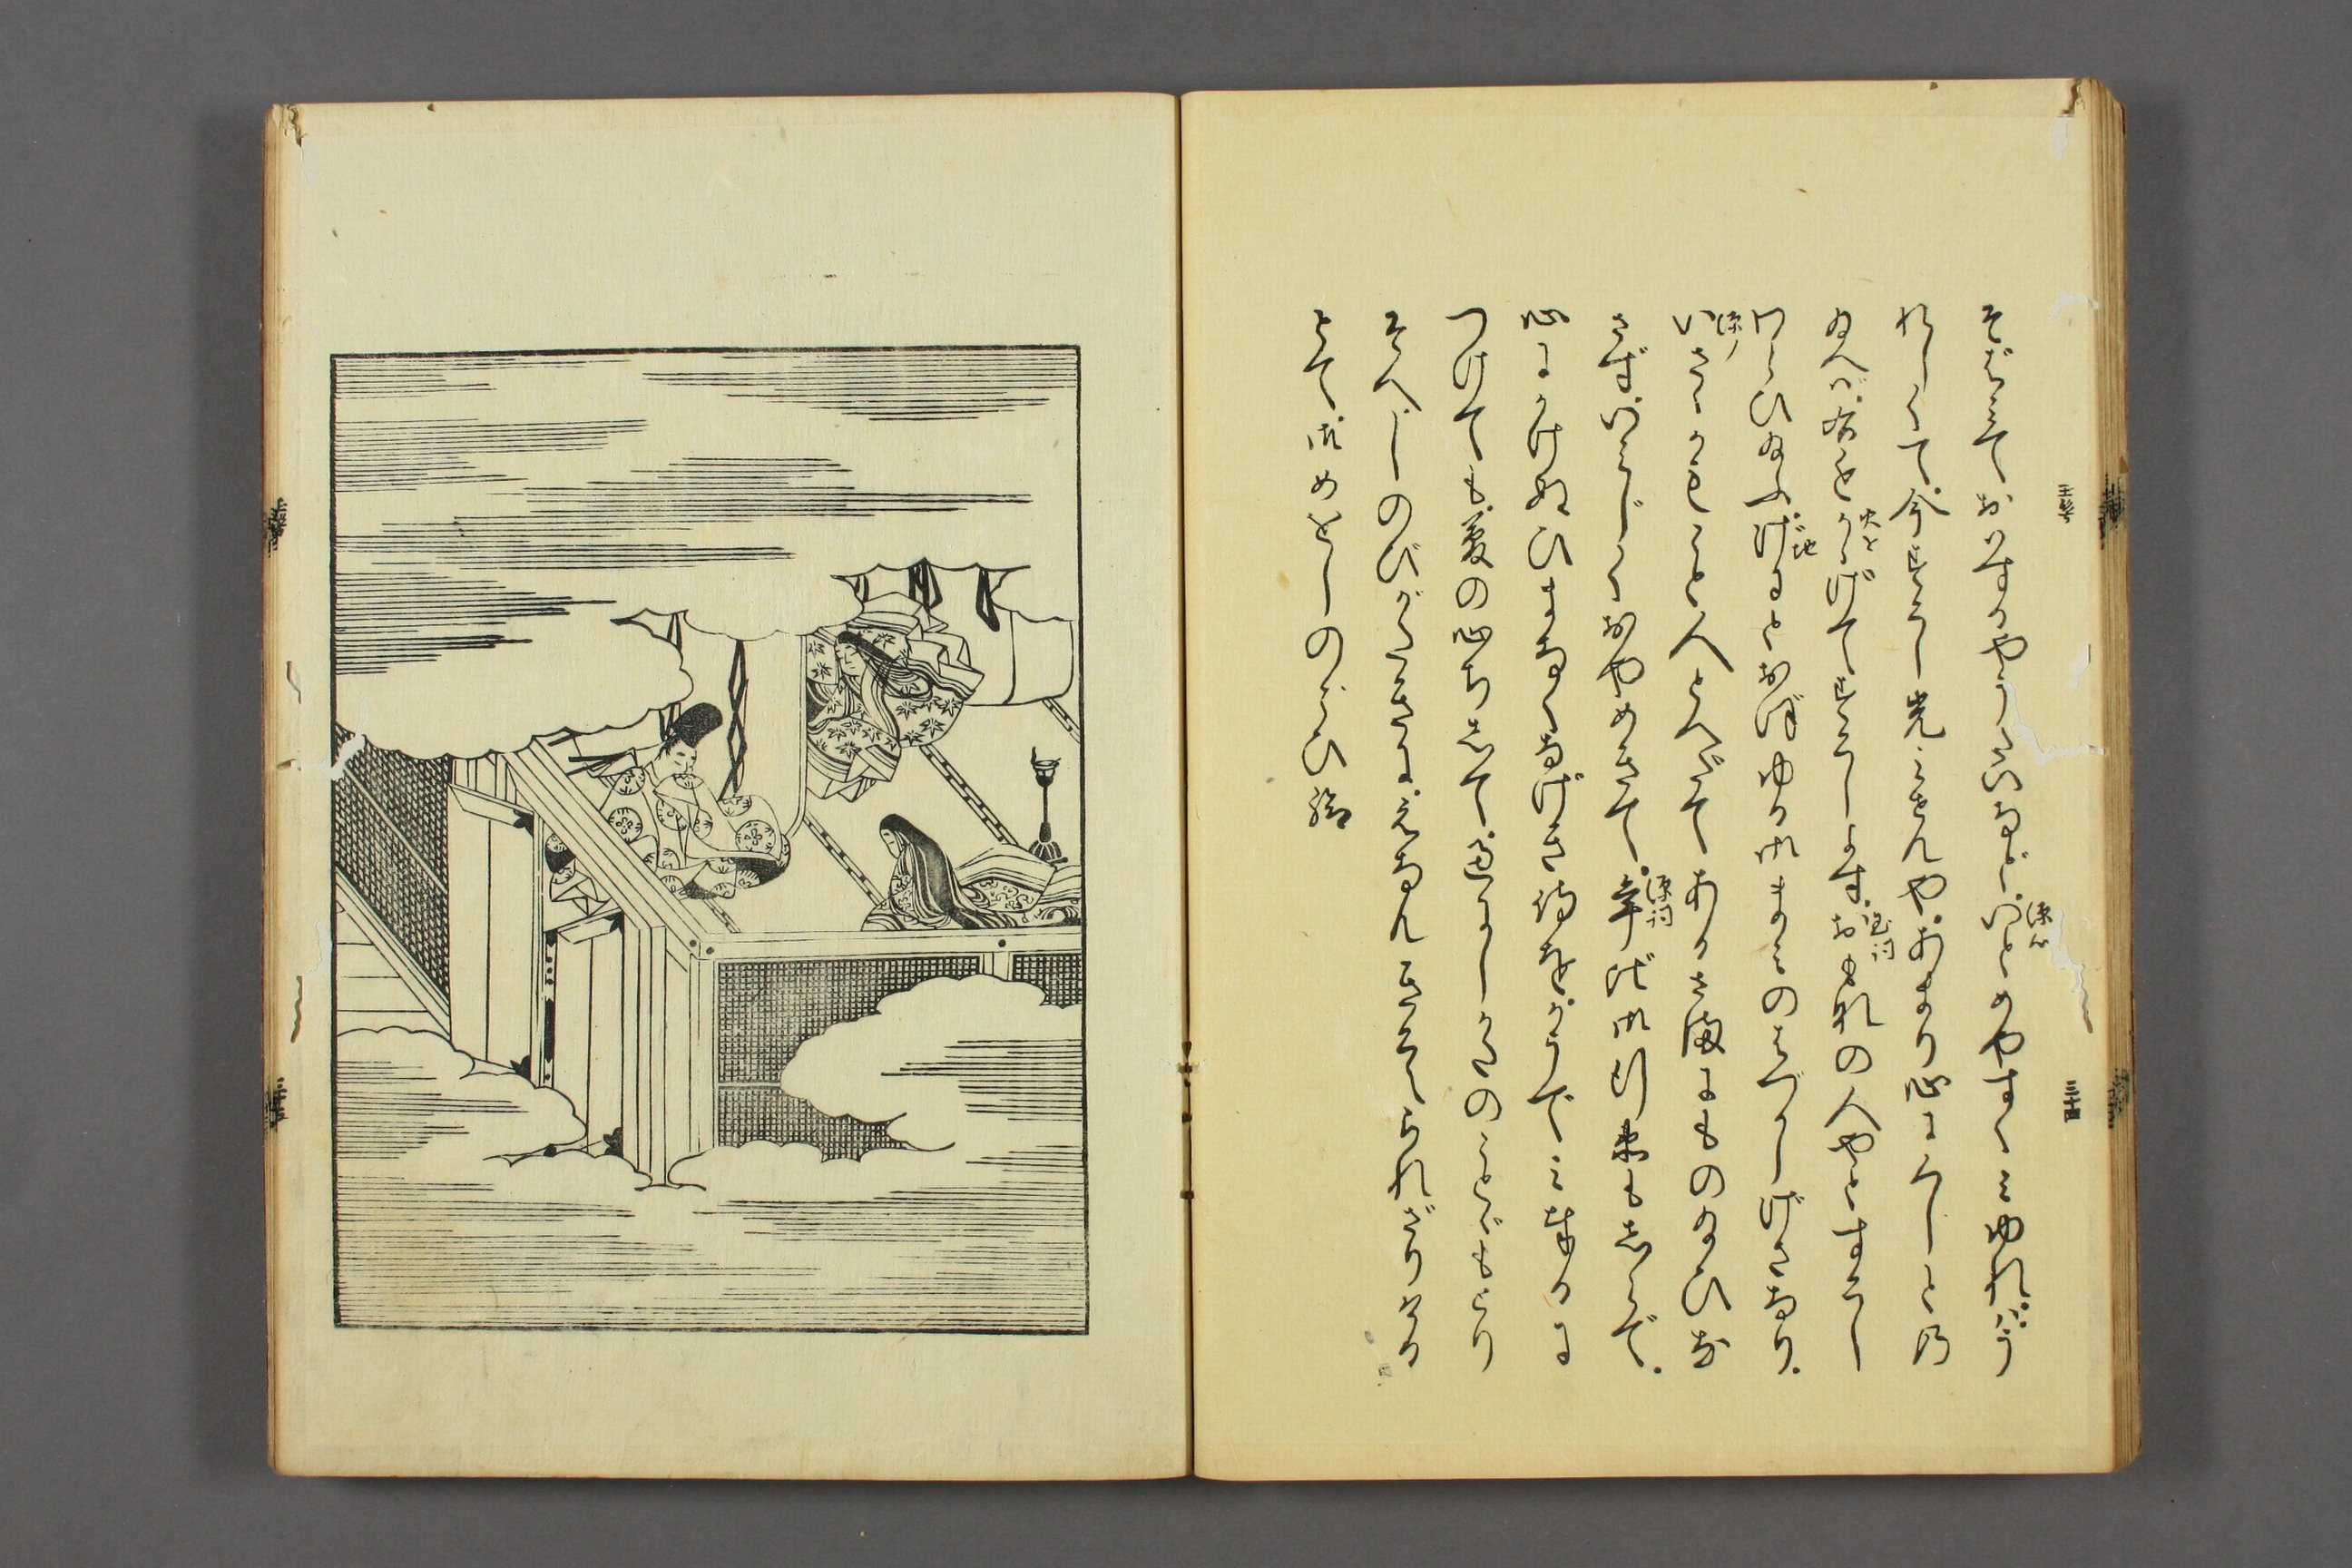 http://archive.wul.waseda.ac.jp/kosho/bunko30/bunko30_a0007/bunko30_a0007_0022/bunko30_a0007_0022_p0036.jpg